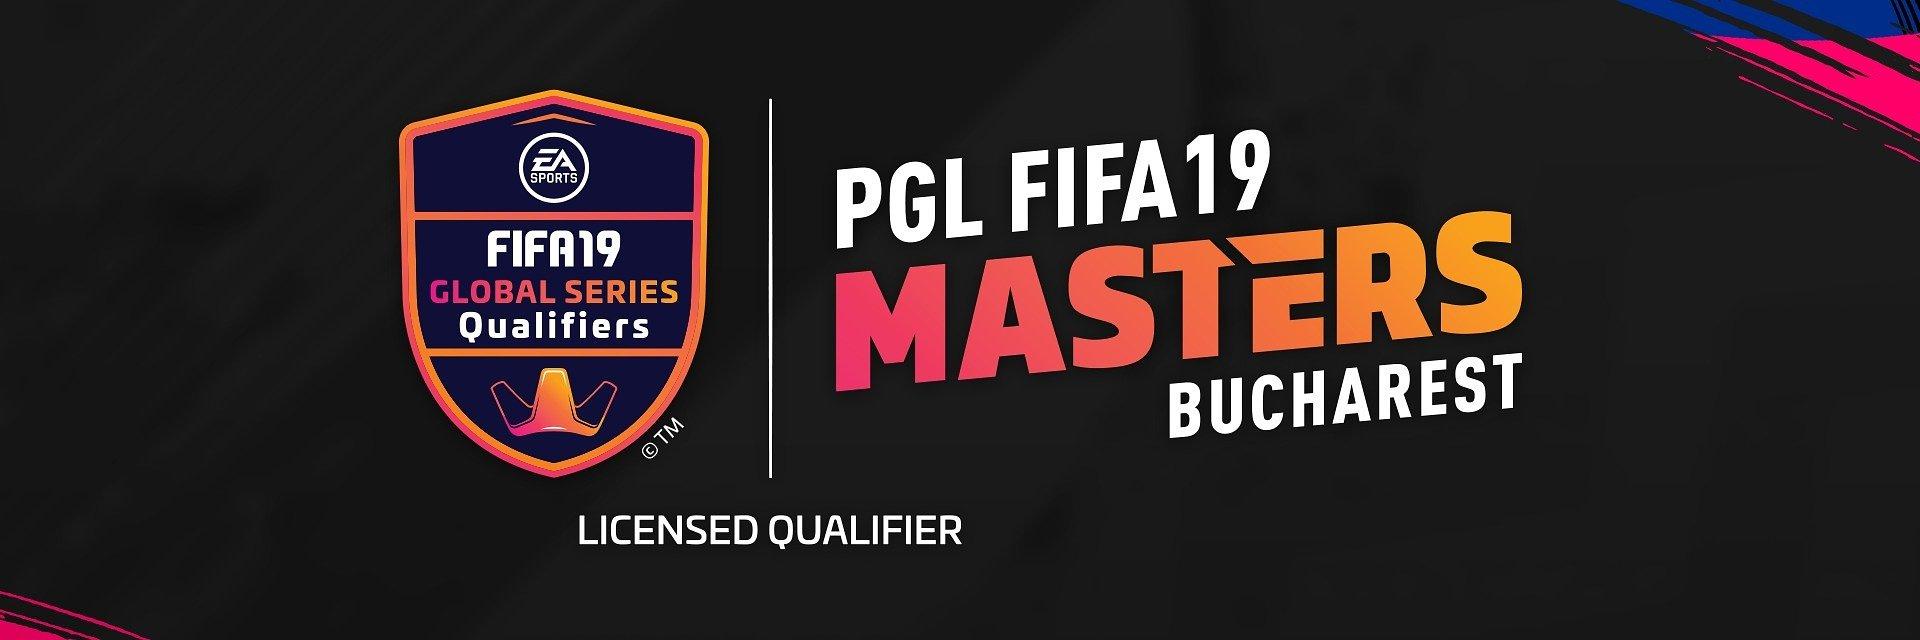 PGL will stream every match of PGL FIFA 19 Masters Bucharest